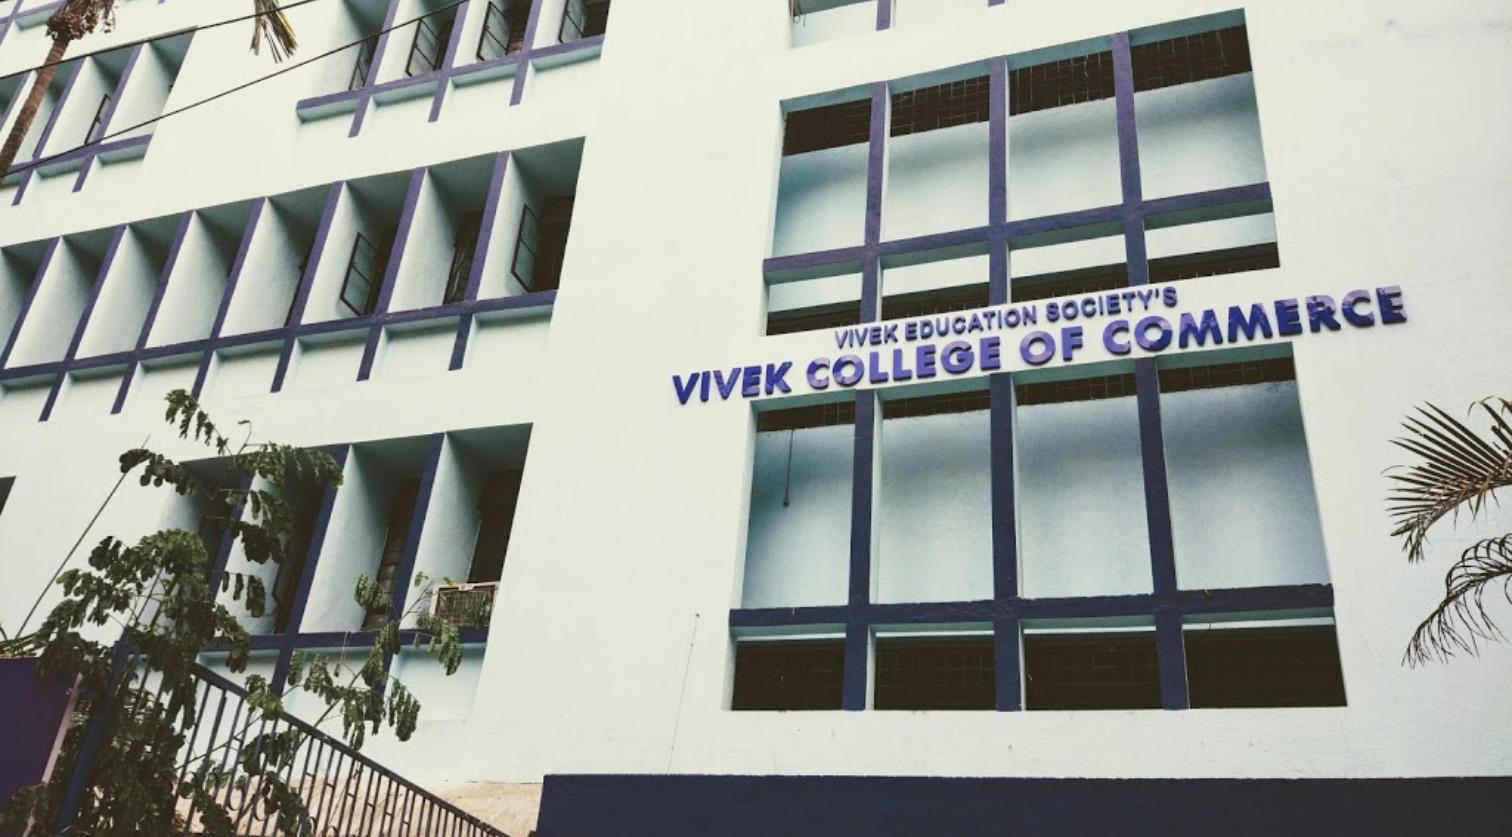 Vivek College of Commerce